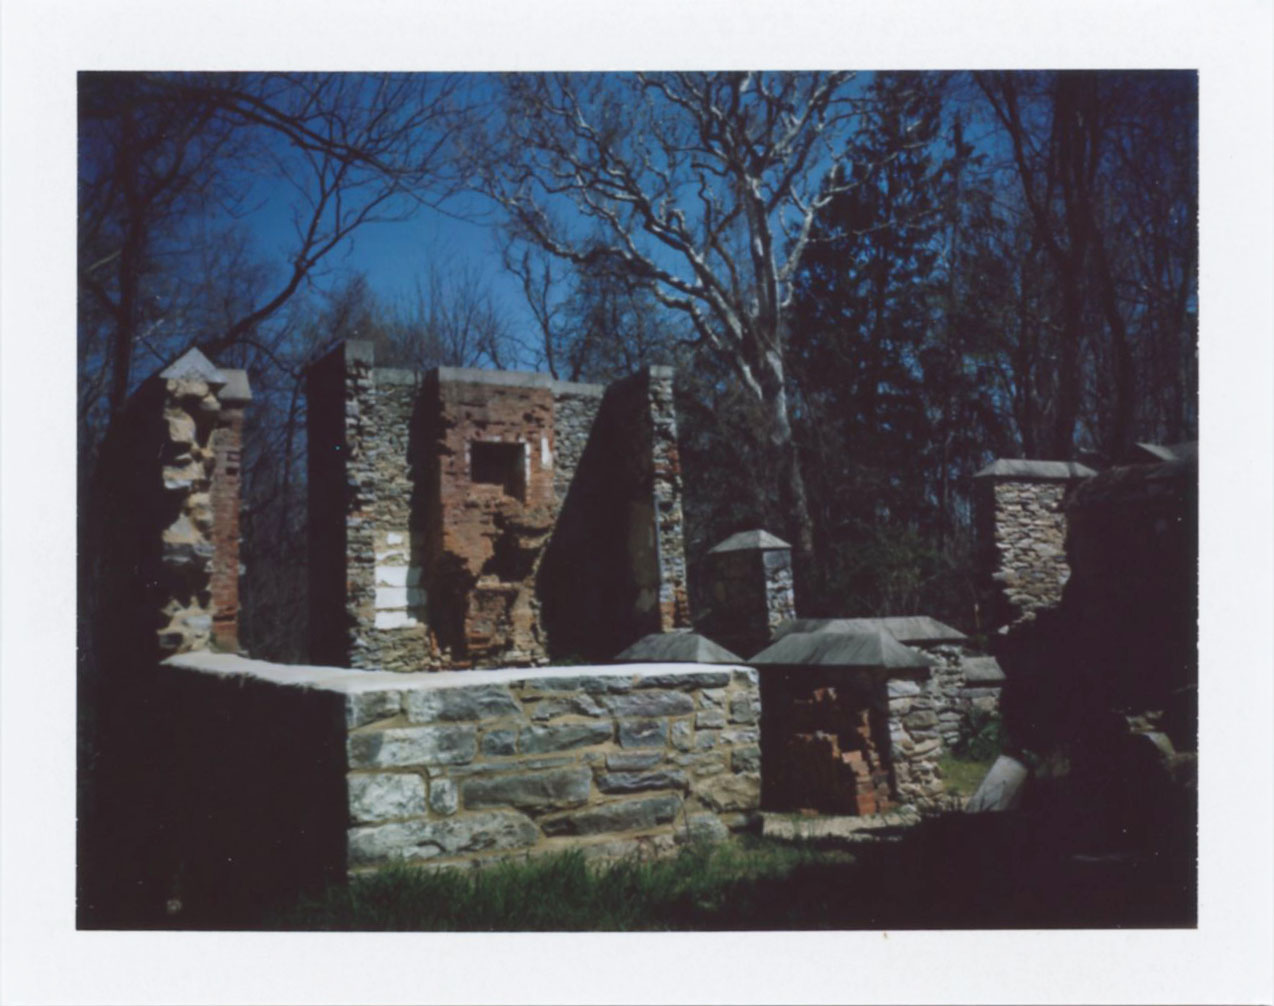 ironmaster_house_ruins.jpg